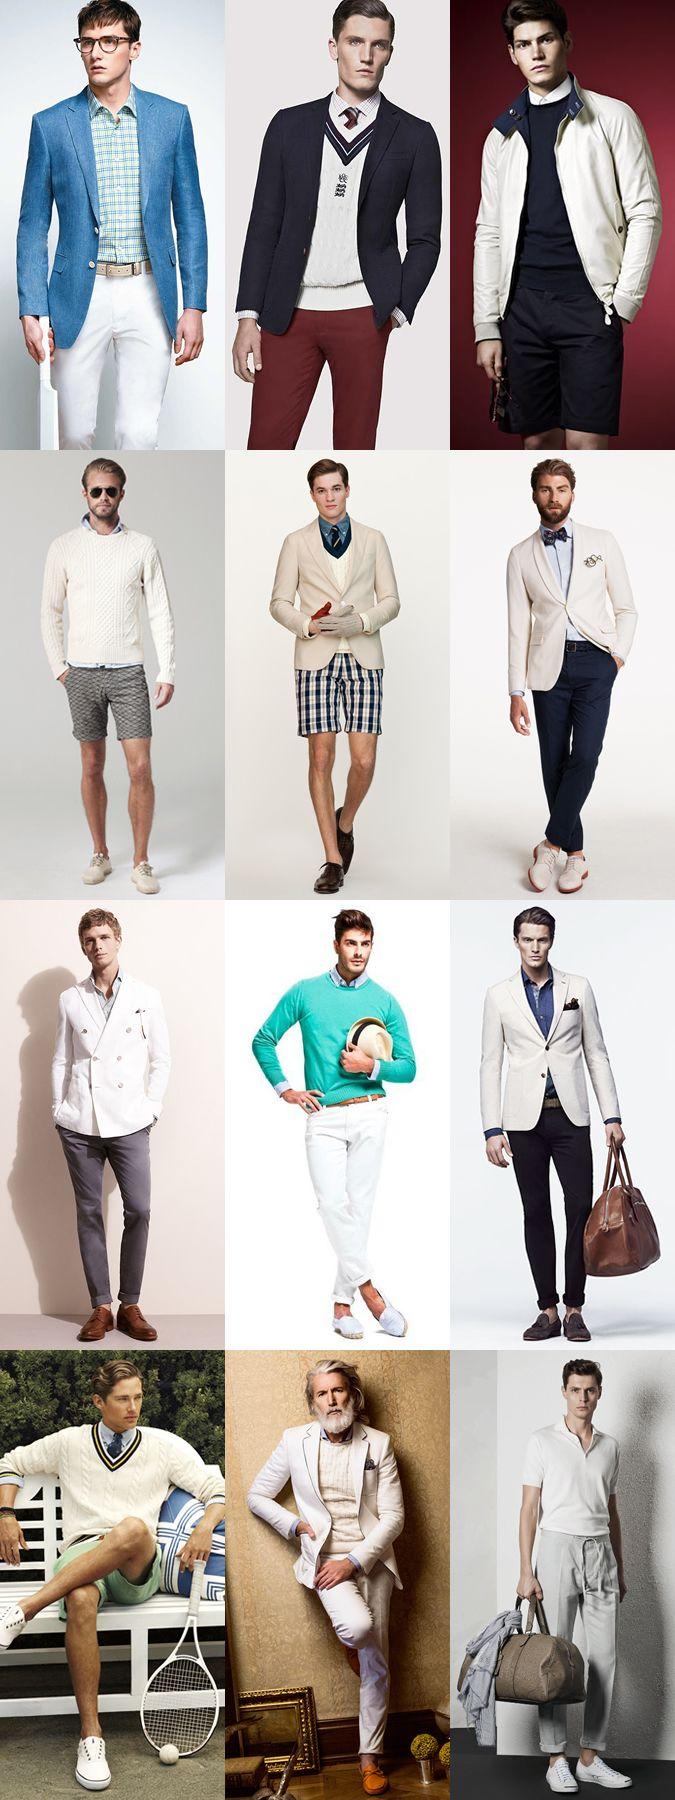 Men's 2014 Spring/Summer The Cricket Influence Summer Whites/Creams Lookbook Inspiration